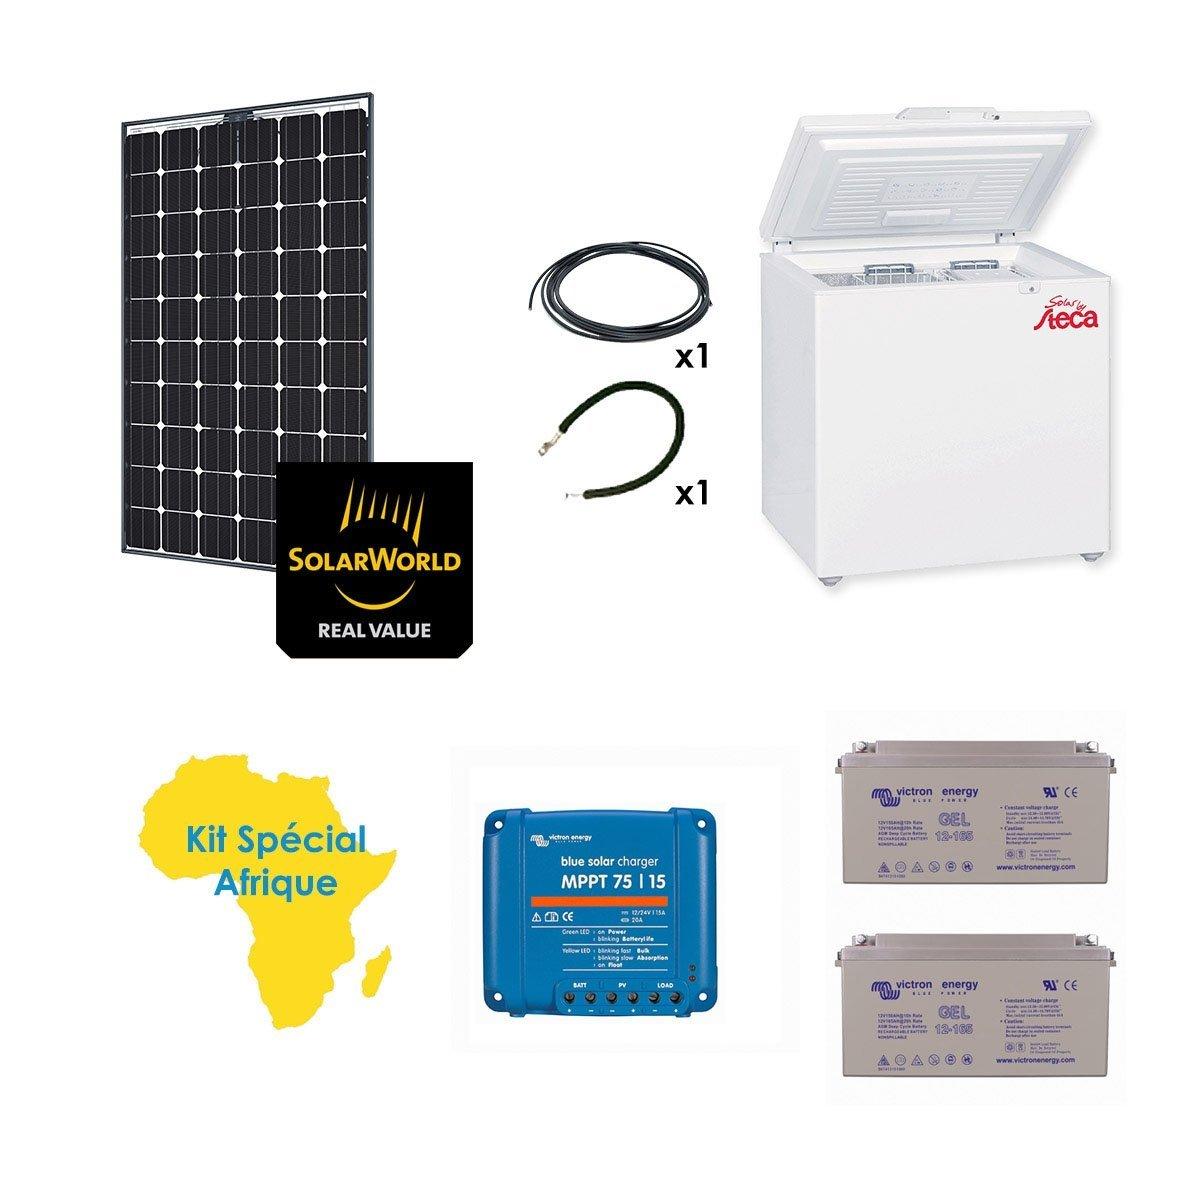 Kit Solar especial África 260 W frigorífico congelador steca 166L ...